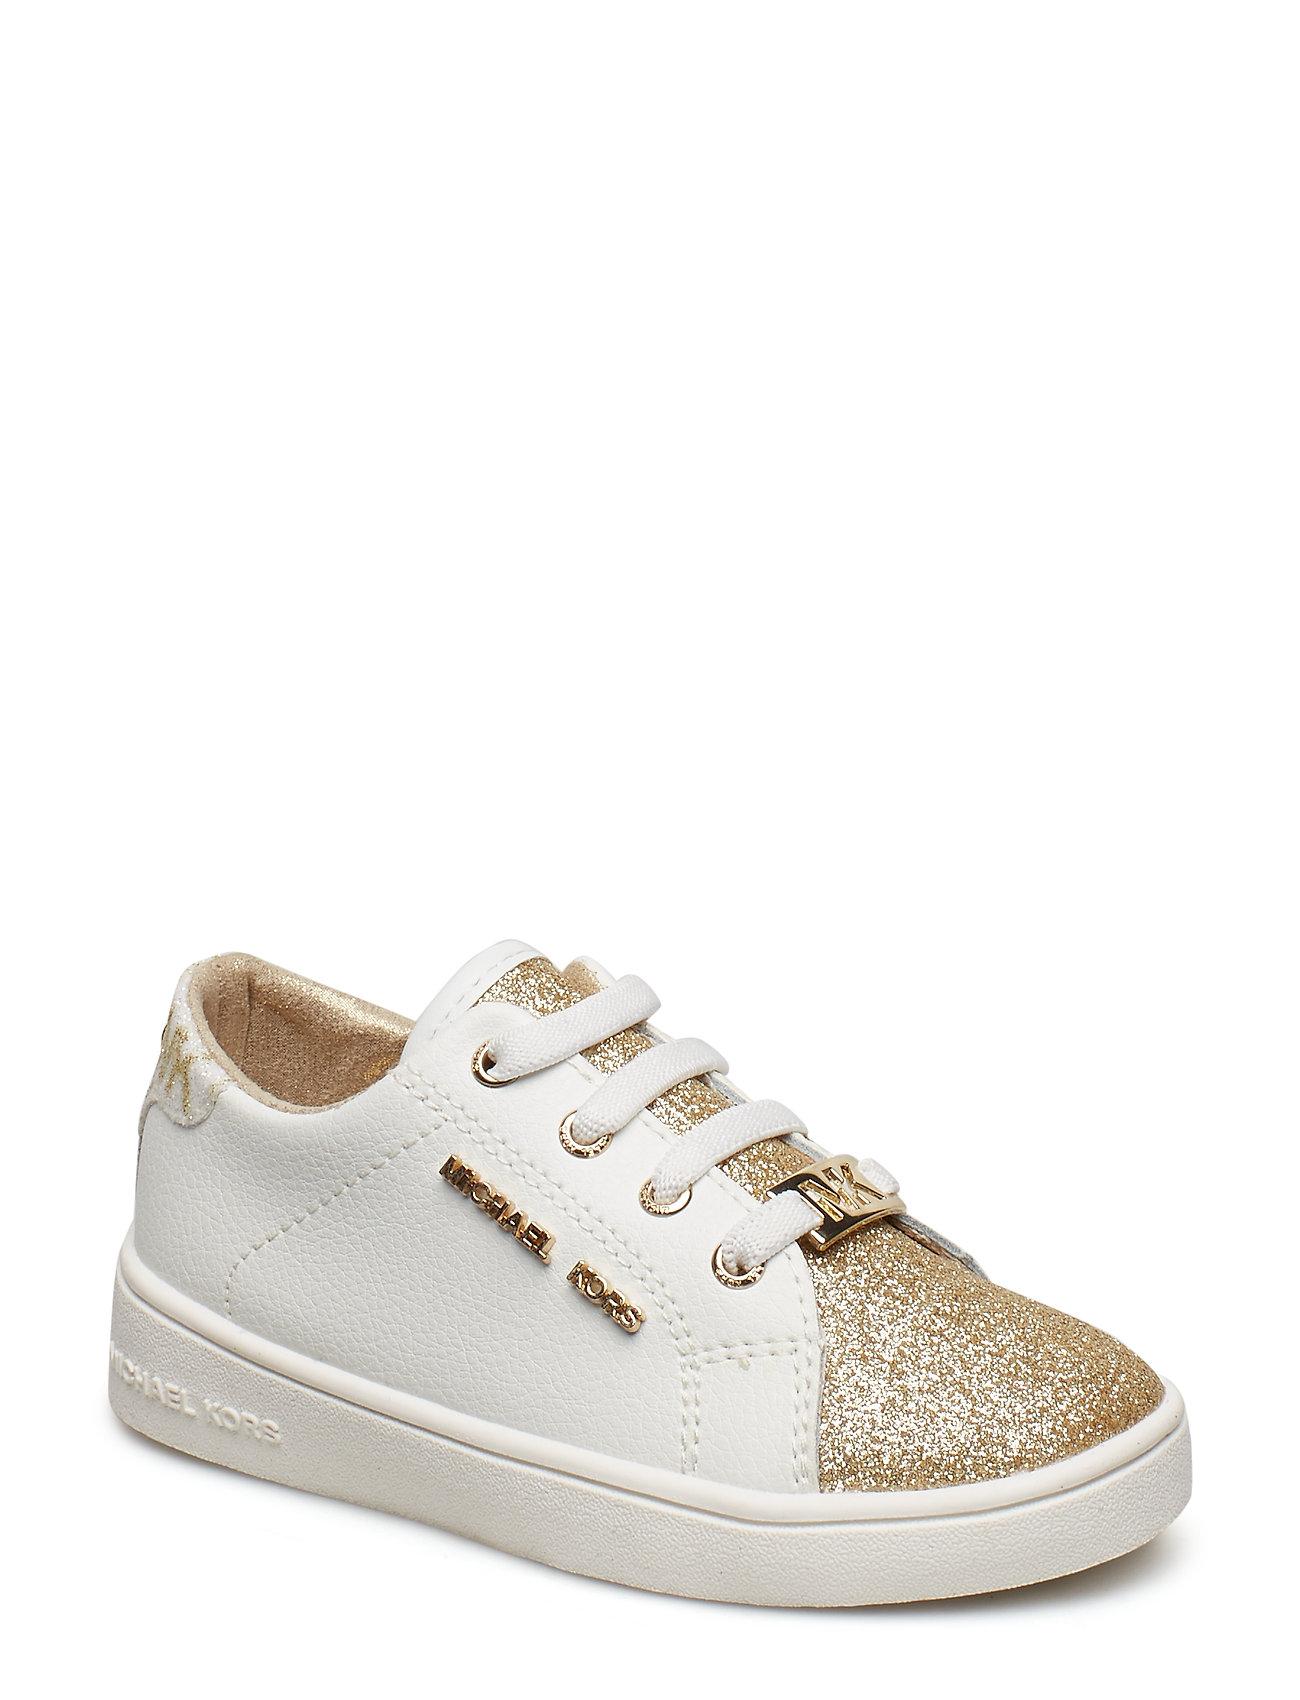 bf55ffa9 Zia Ivy Martin-t (White Gold) (486.85 kr) - Michael Kors Kids ...